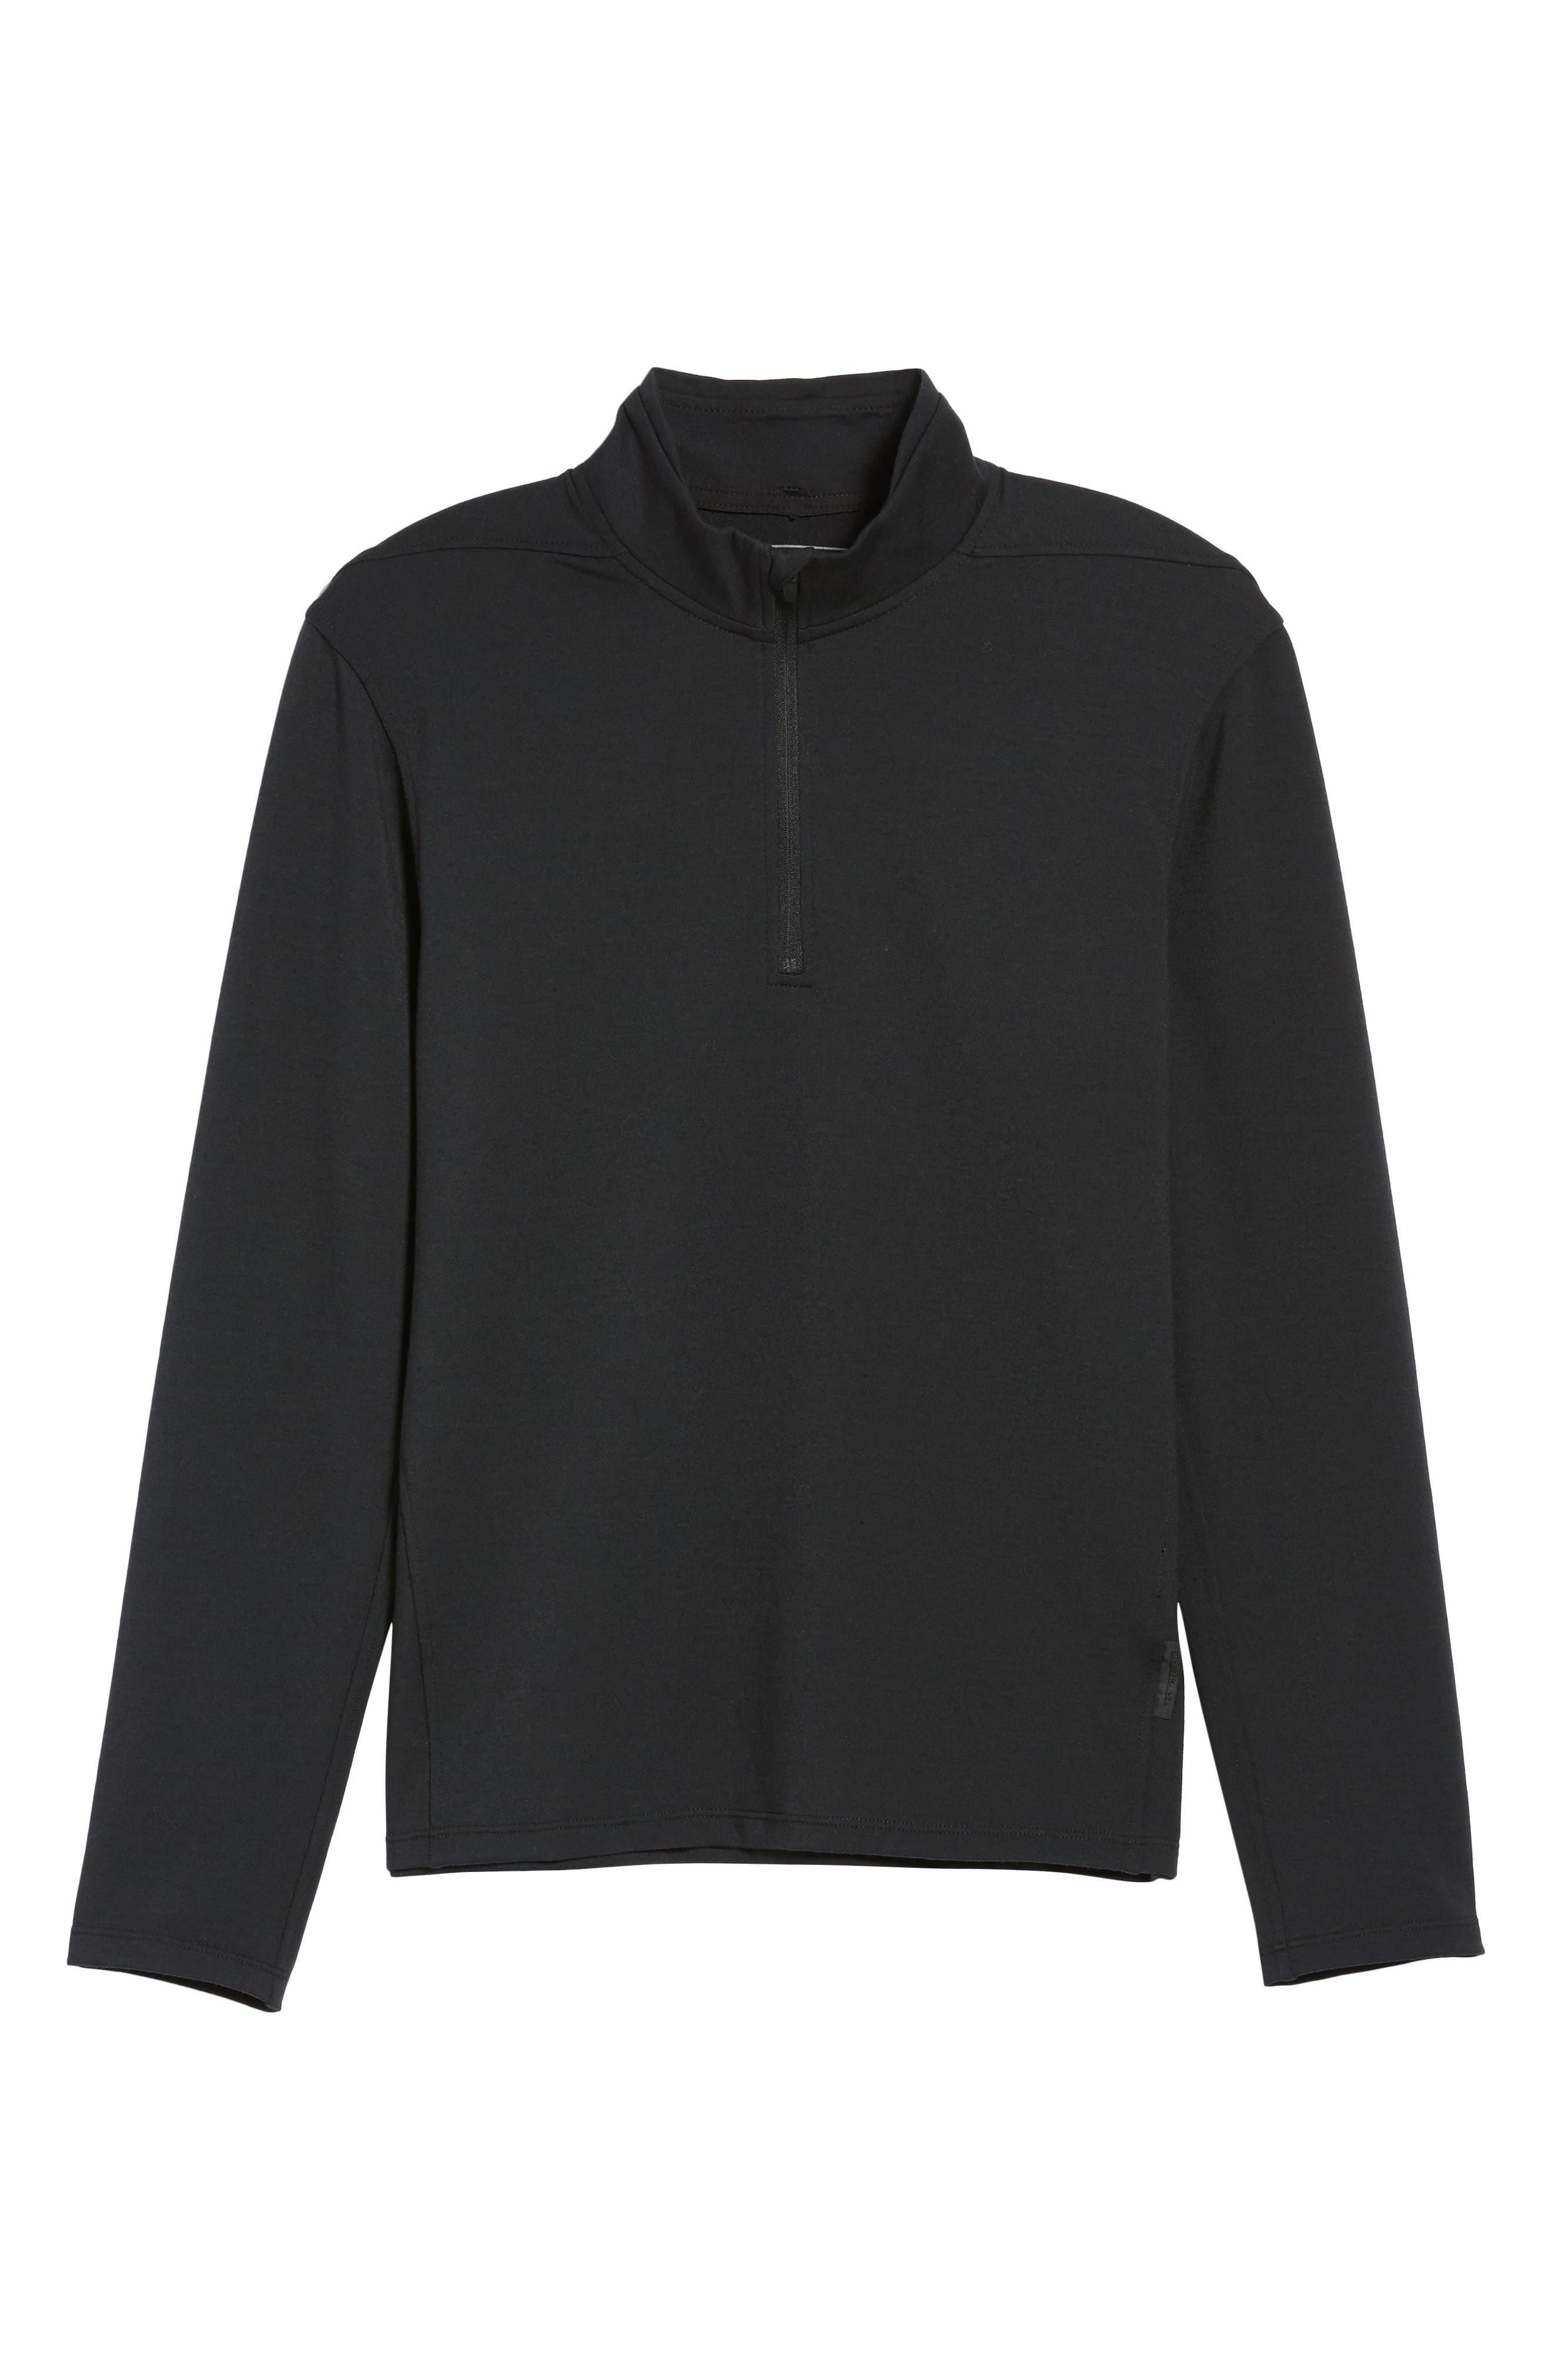 Distance Quarter Zip Pullover,                             Alternate thumbnail 6, color,                             Black